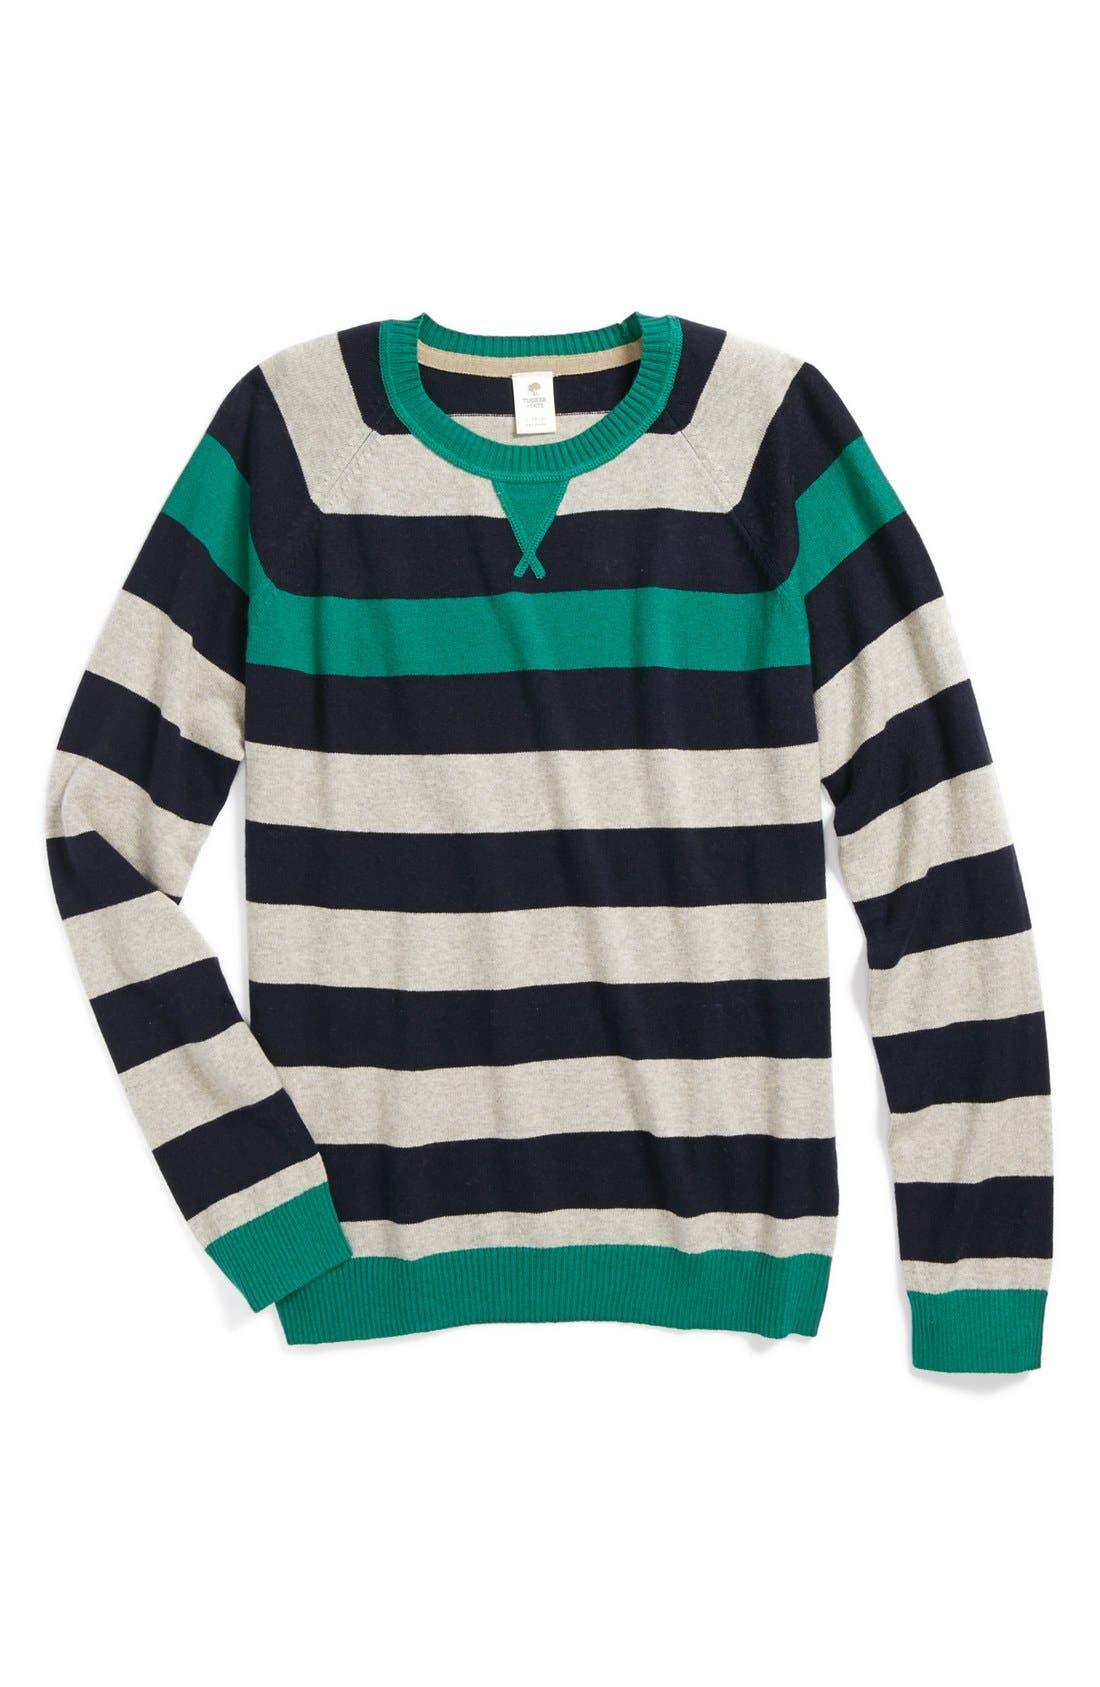 Main Image - Tucker + Tate 'Capital Street' Sweater (Big Boys)